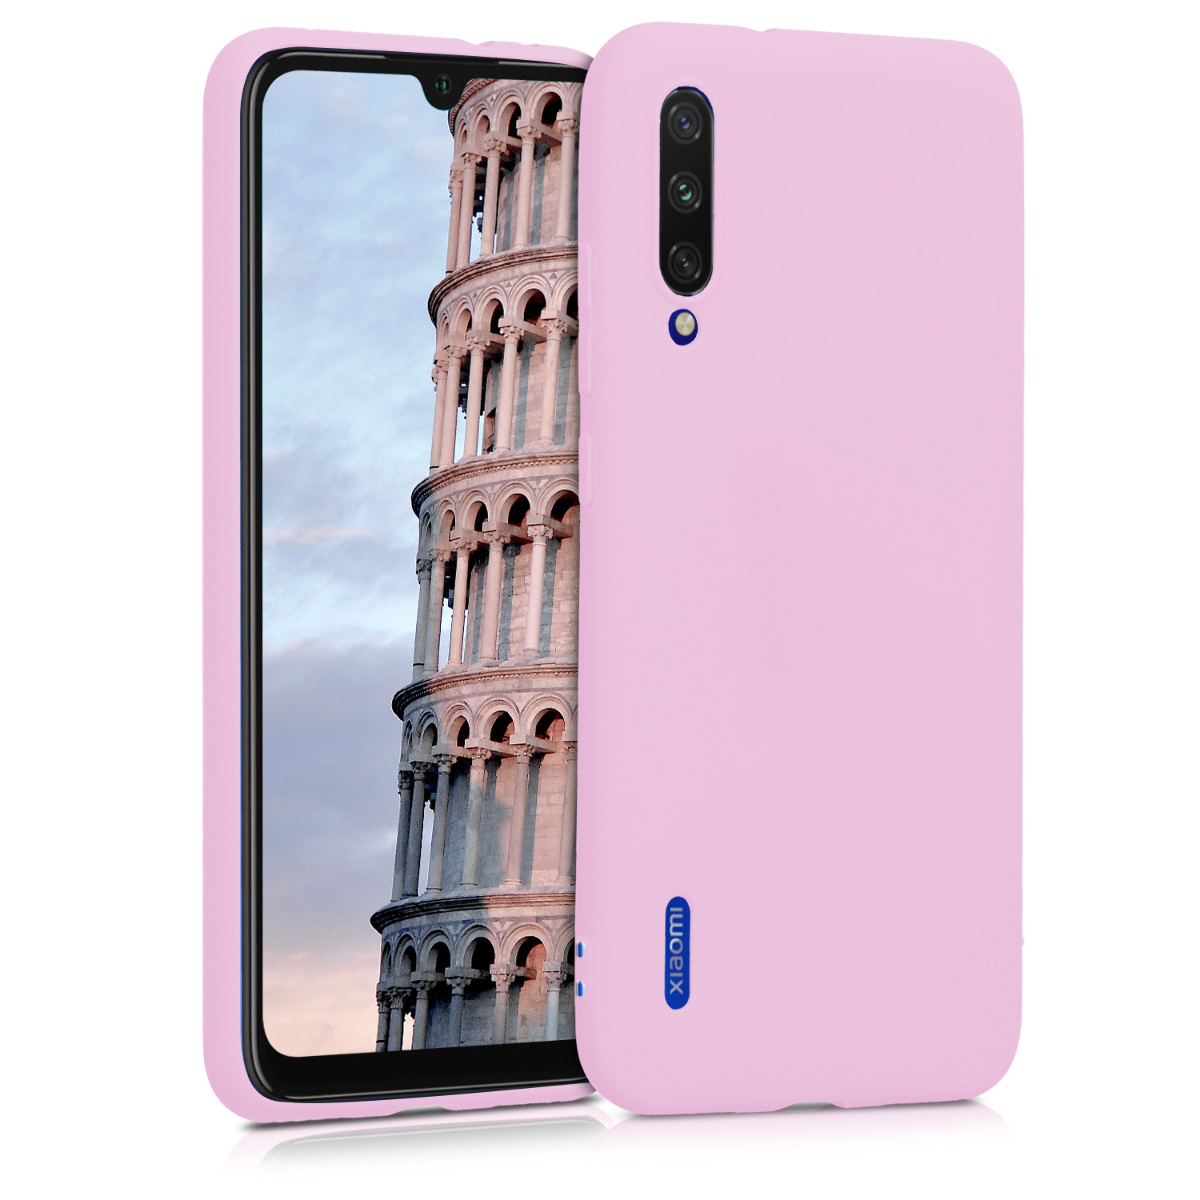 KW Θήκη Σιλικόνης Xiaomi Mi A3 - Light Pink Matte (49674.63)